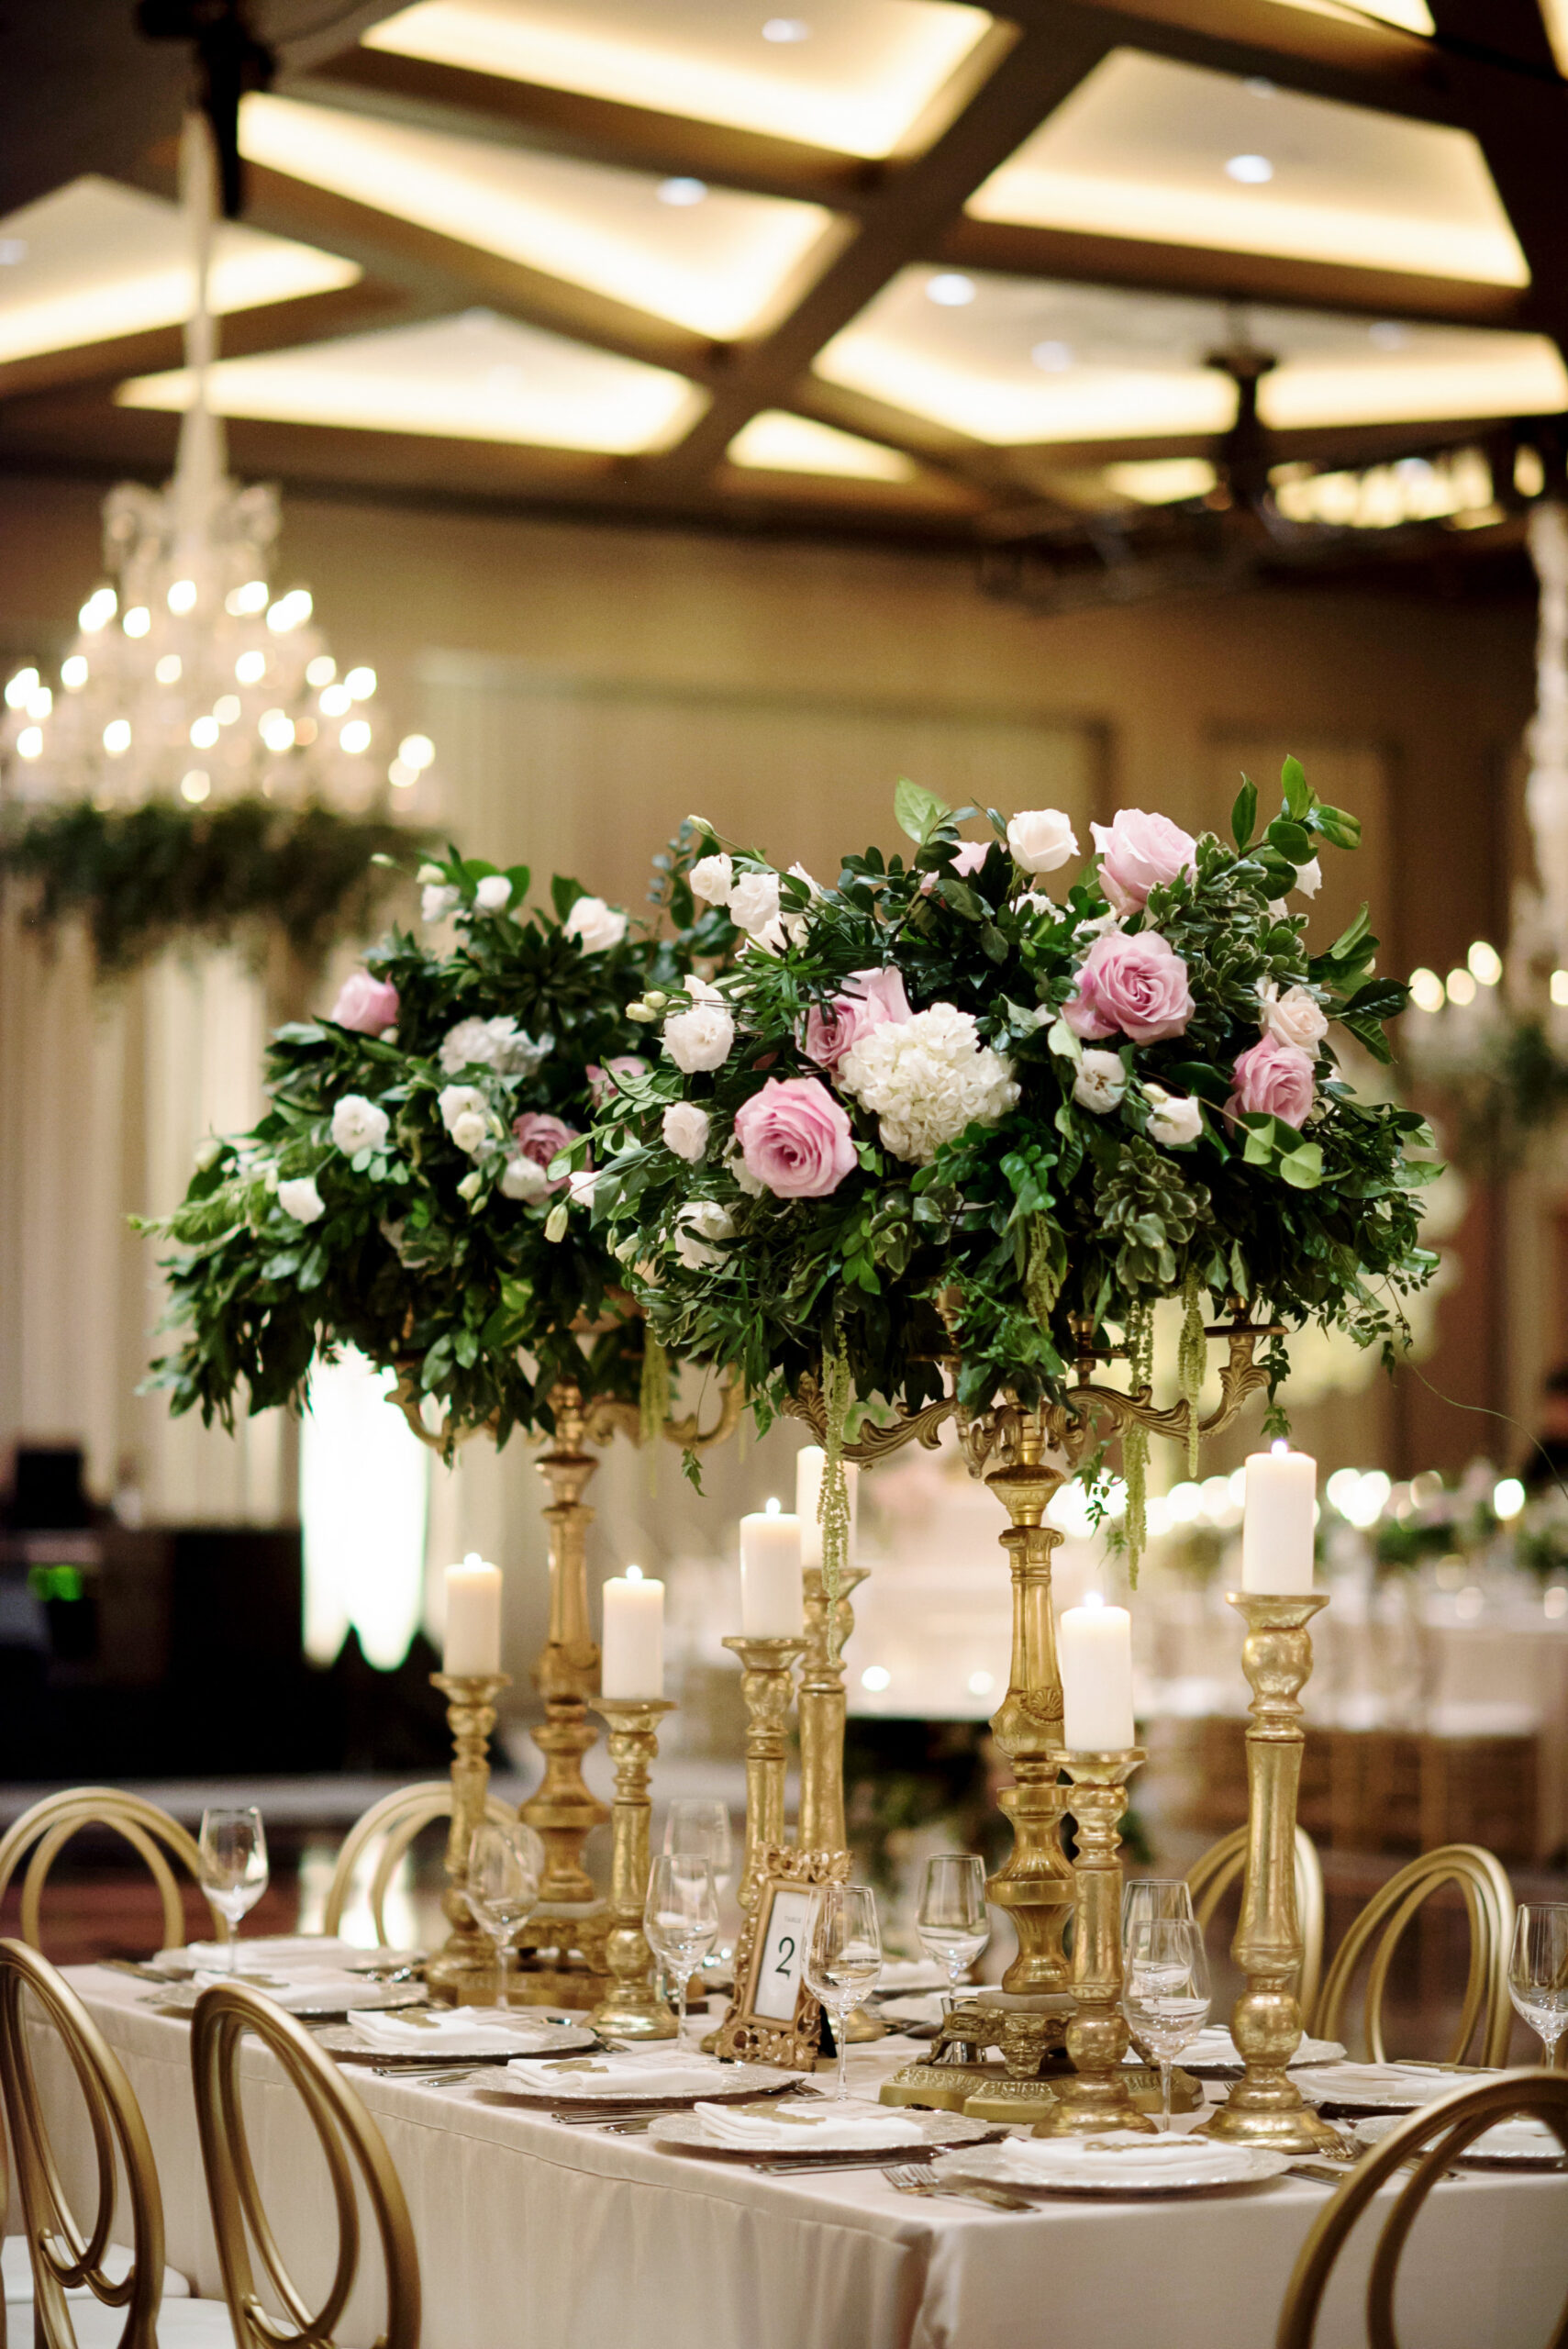 https://secureservercdn.net/45.40.145.151/kgq.ab5.myftpupload.com/wp-content/uploads/2020/04/Sanam-Soroush-s-Wedding-wedluxe-submission-0084-scaled.jpg?time=1634407926